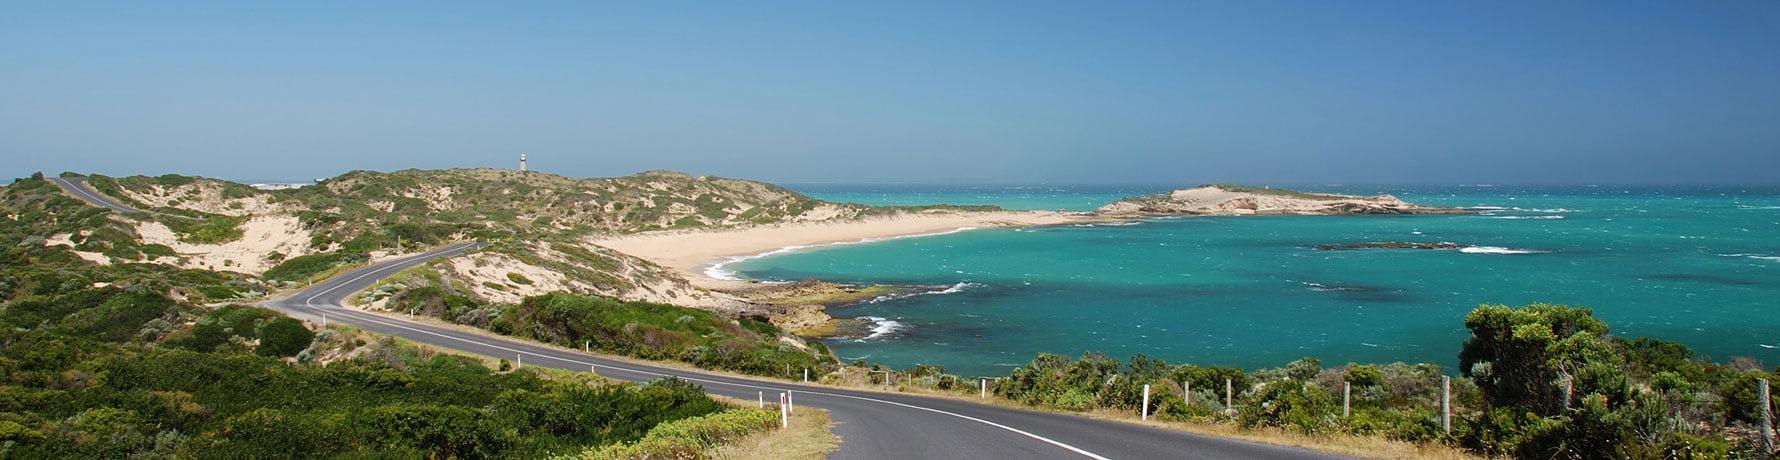 Australia Tropical: Sunshine Coast!